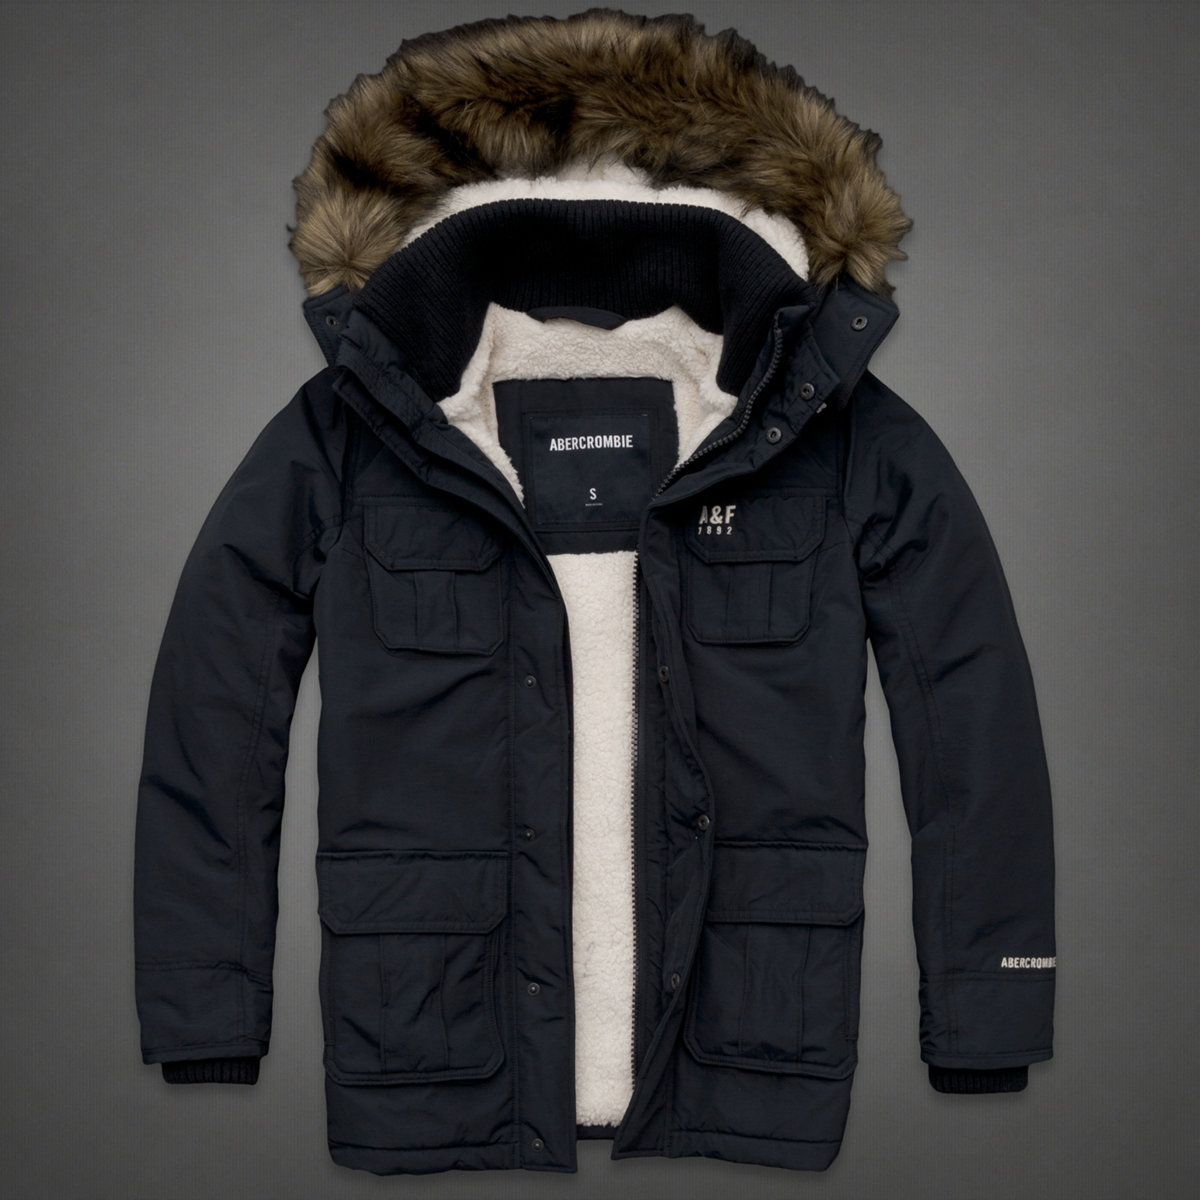 Abercrombie Com Mens Attire Winter Fashion Casual Mens Outfits [ 1200 x 1200 Pixel ]